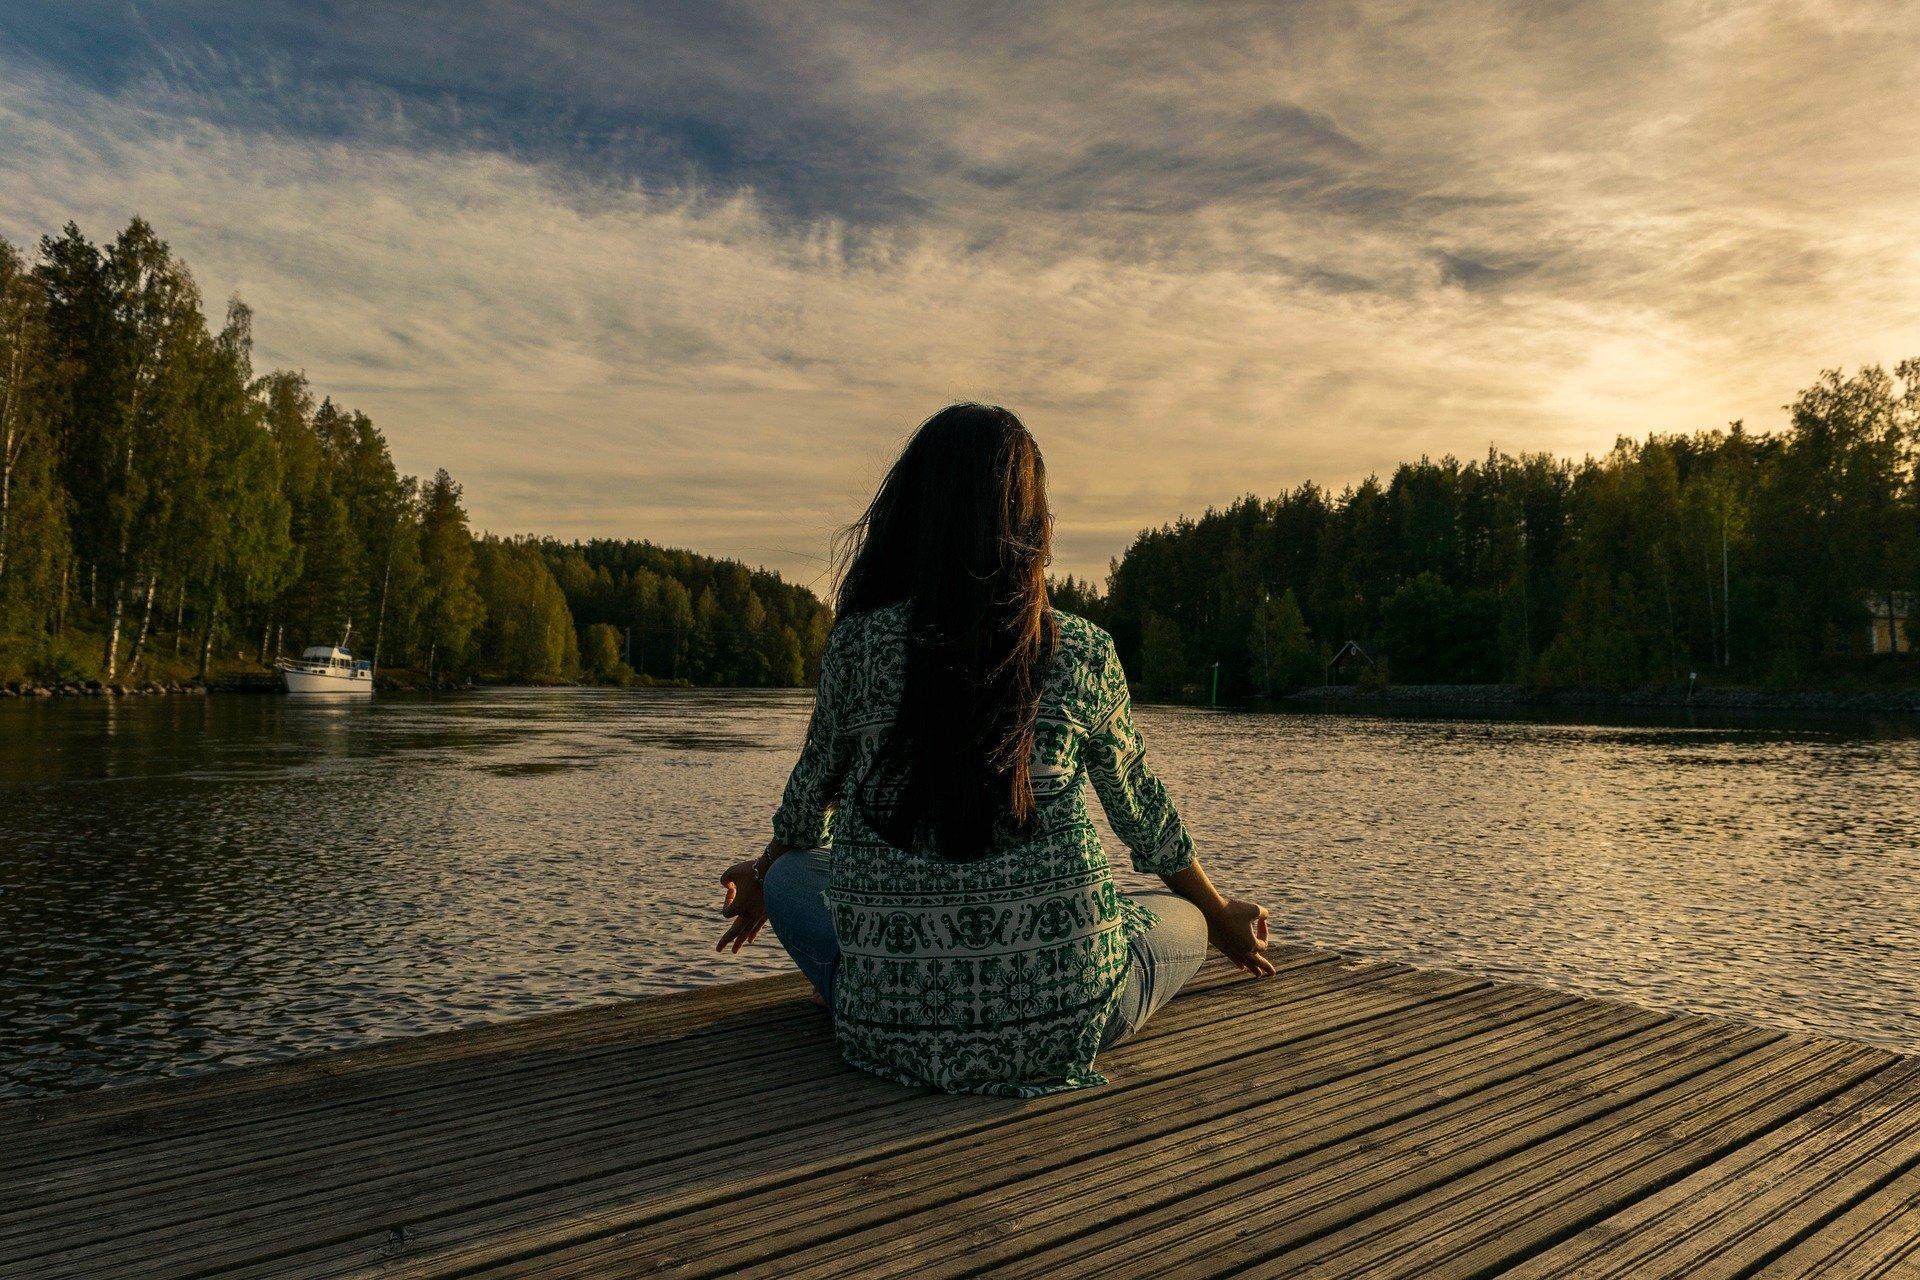 Woman sitting by the lake meditating